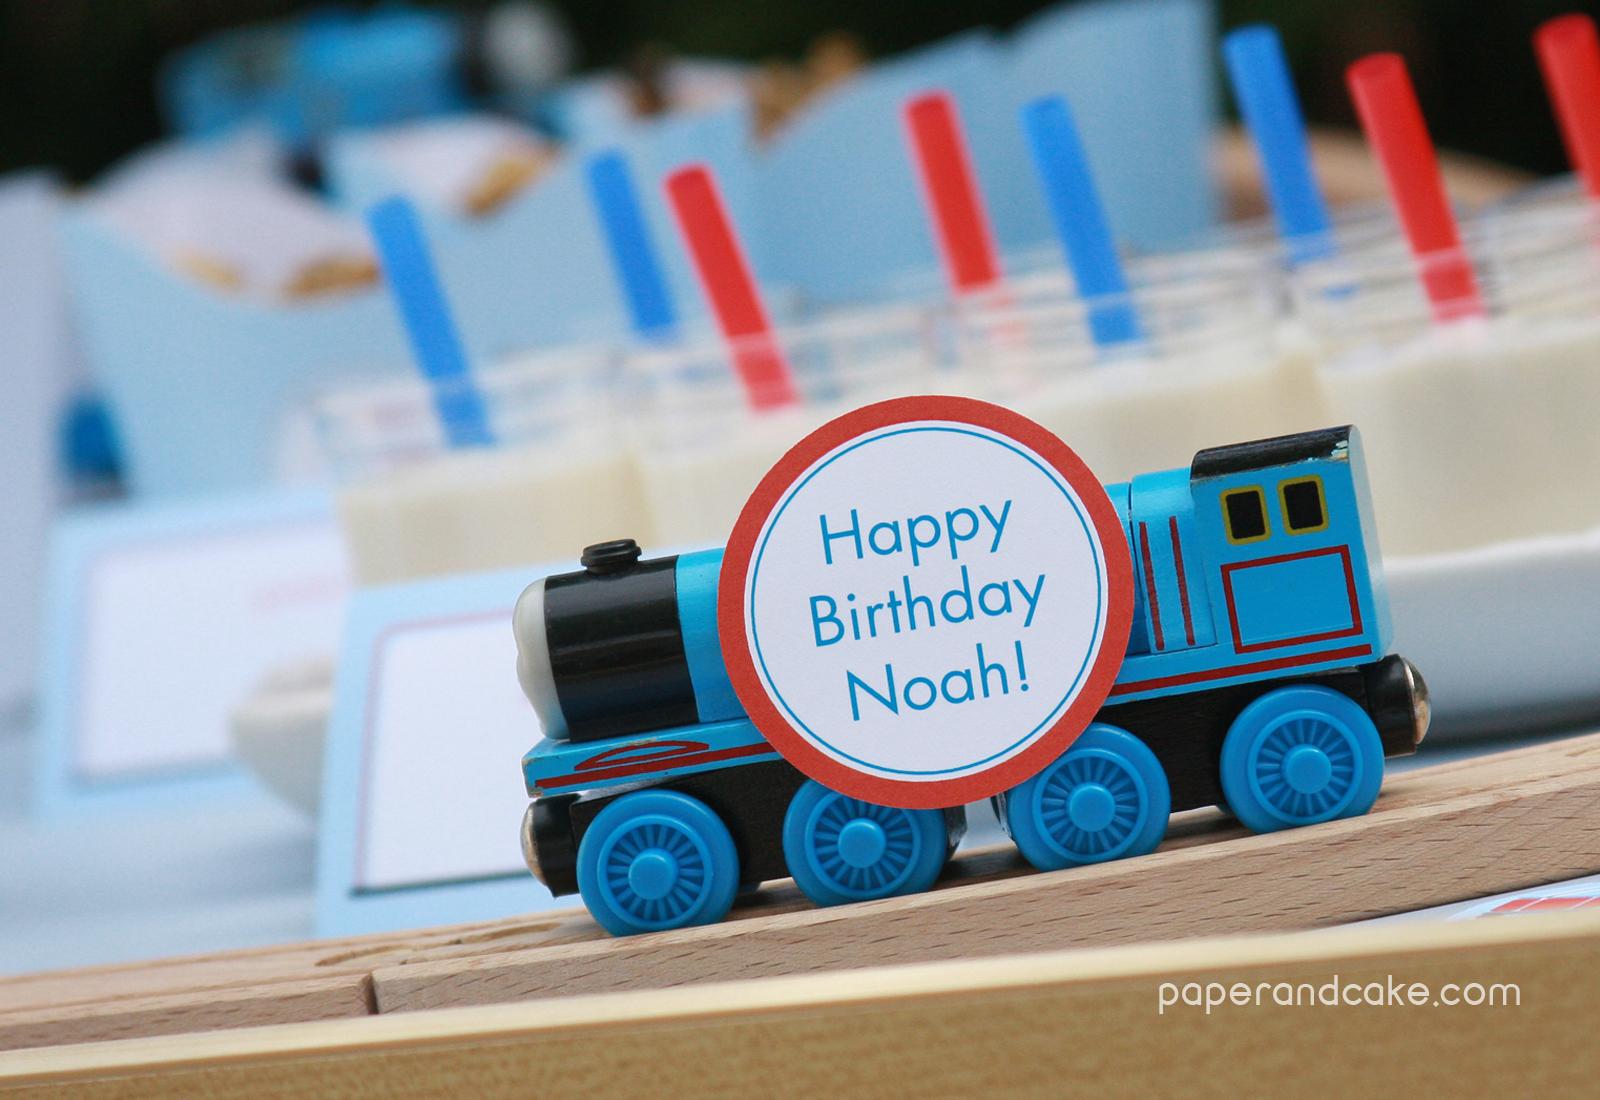 Train Birthday Party Decorations | 1600 x 1100 · 1196 kB · jpeg